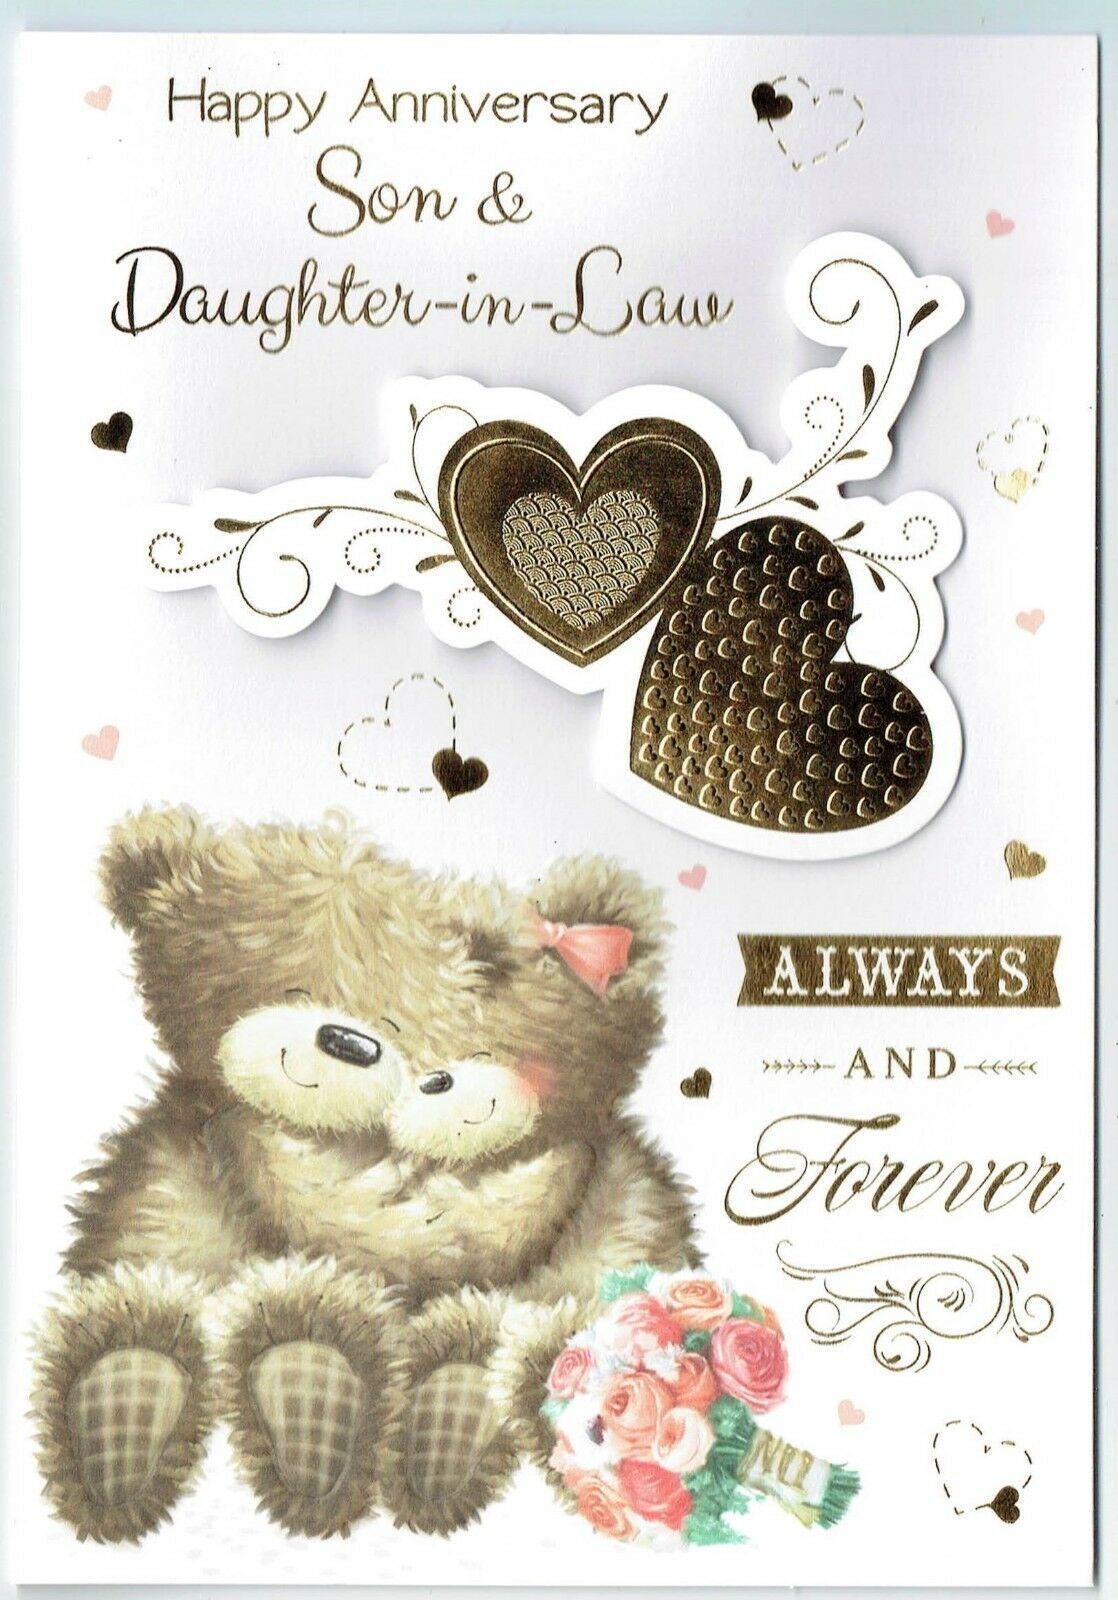 Son Daughter In Law Anniversary Card Cute Teddy Bear Design Cute Anniversary Cards Ideas 2019 Teddy Bear Design Anniversary Cards Anniversary Card For Parents